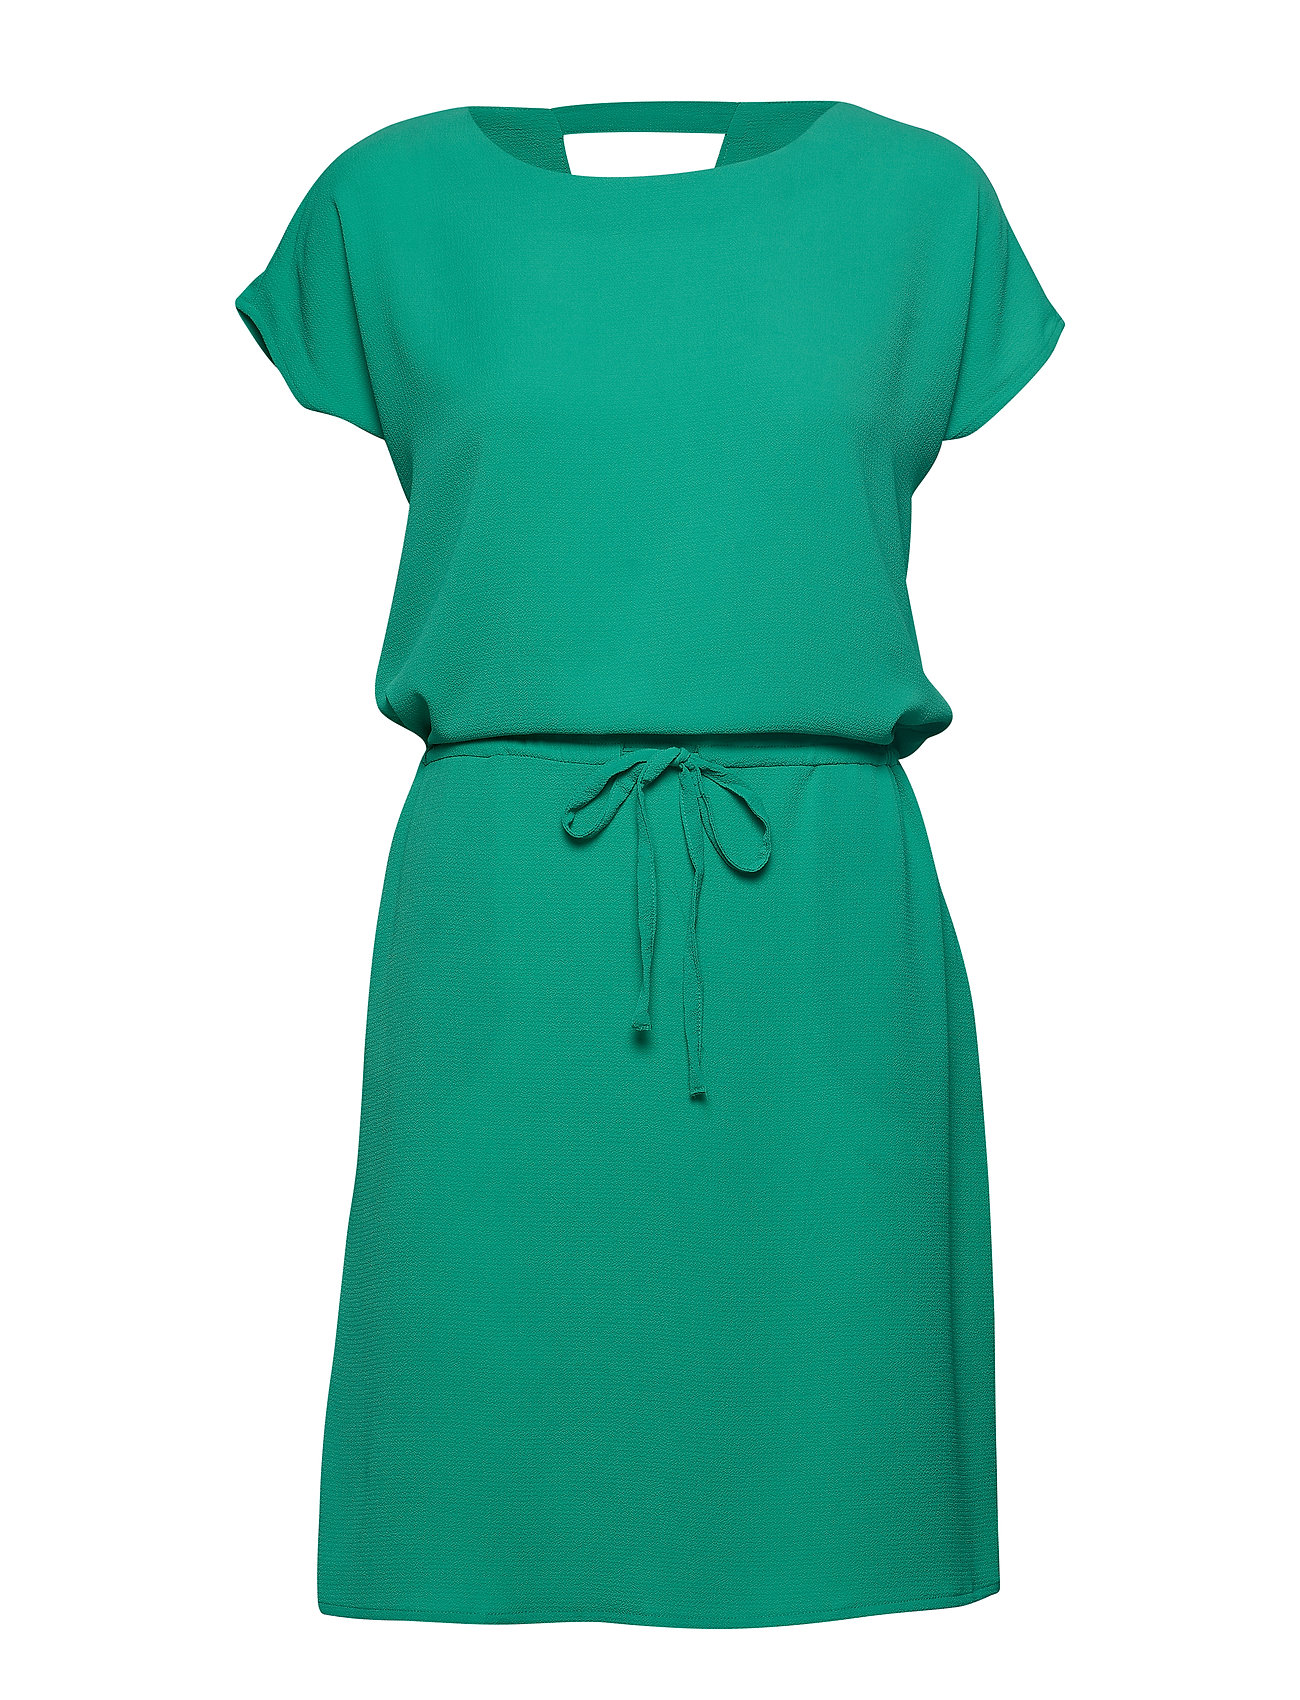 3d2988e49 Onlnova Lux Solid Connie Bali Dress Wvn Knælang Kjole Grøn ONLY